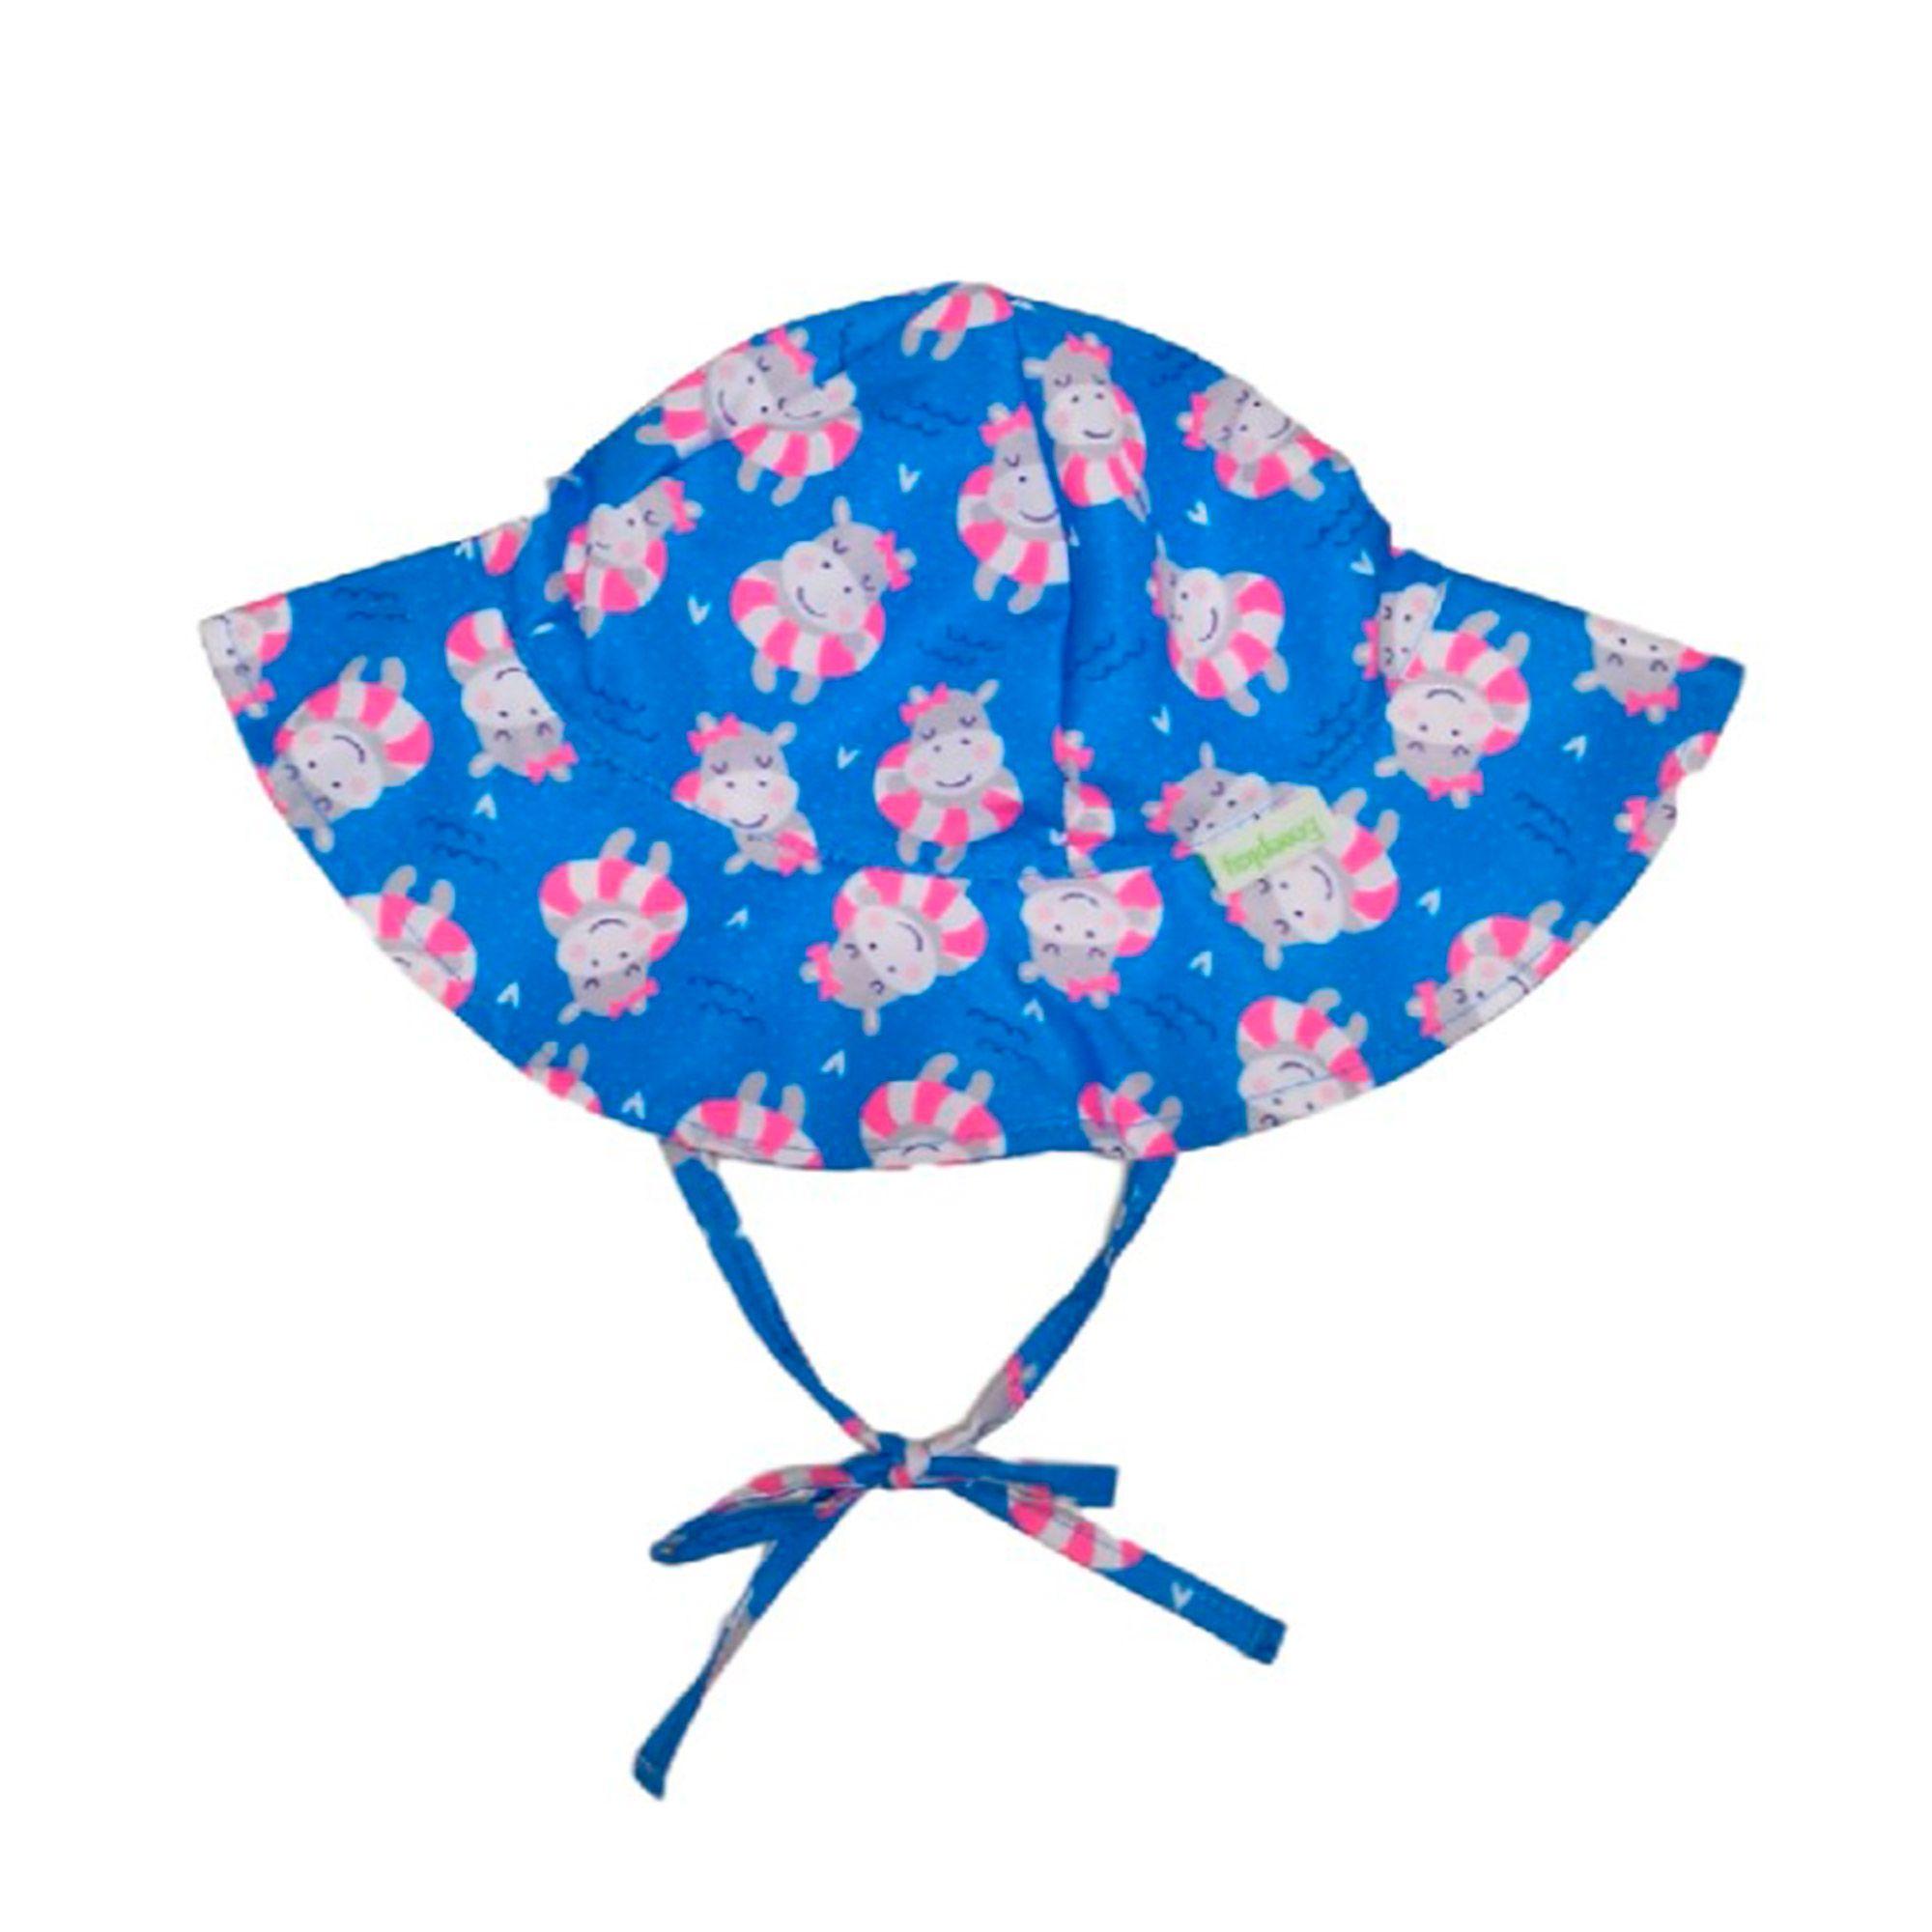 Ecoeplay - Chapéu de Praia - Popotinha - Tamanho M